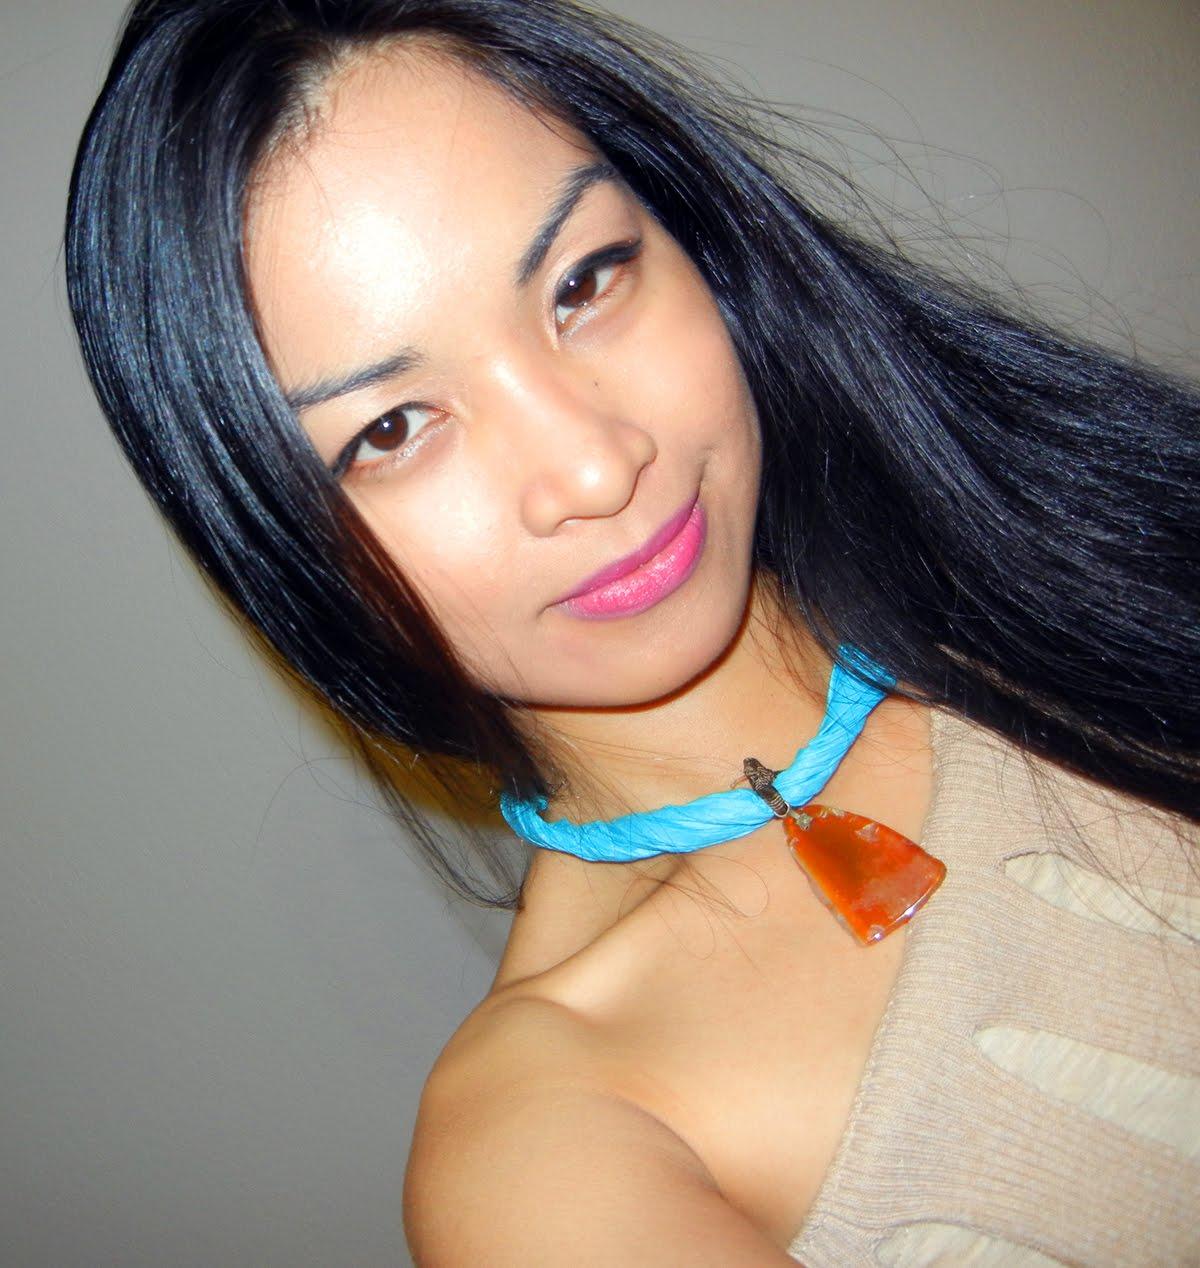 http://3.bp.blogspot.com/-NNrT-ntOUXU/Ts6wJBQ2QbI/AAAAAAAAACM/l5IYxtmSXaE/s1600/HPocahontasheadshot.jpg